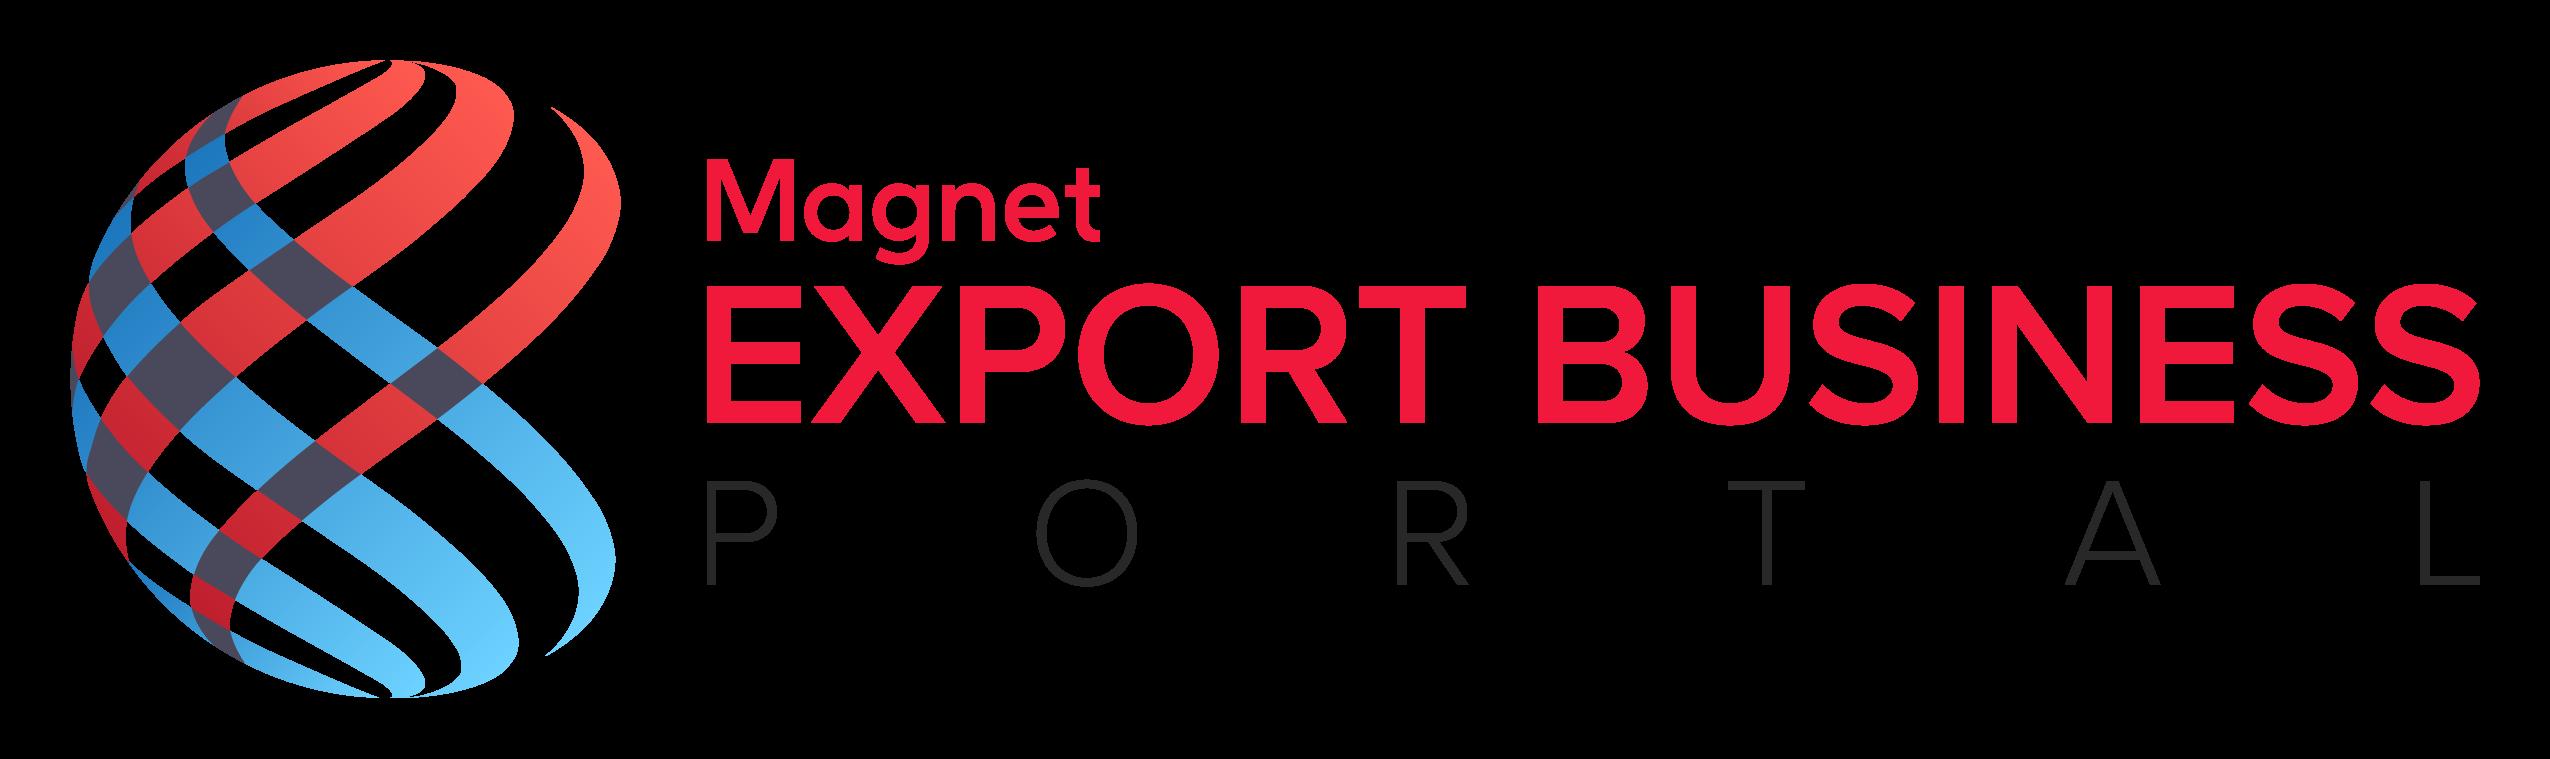 Magnet Export Business Portal logo